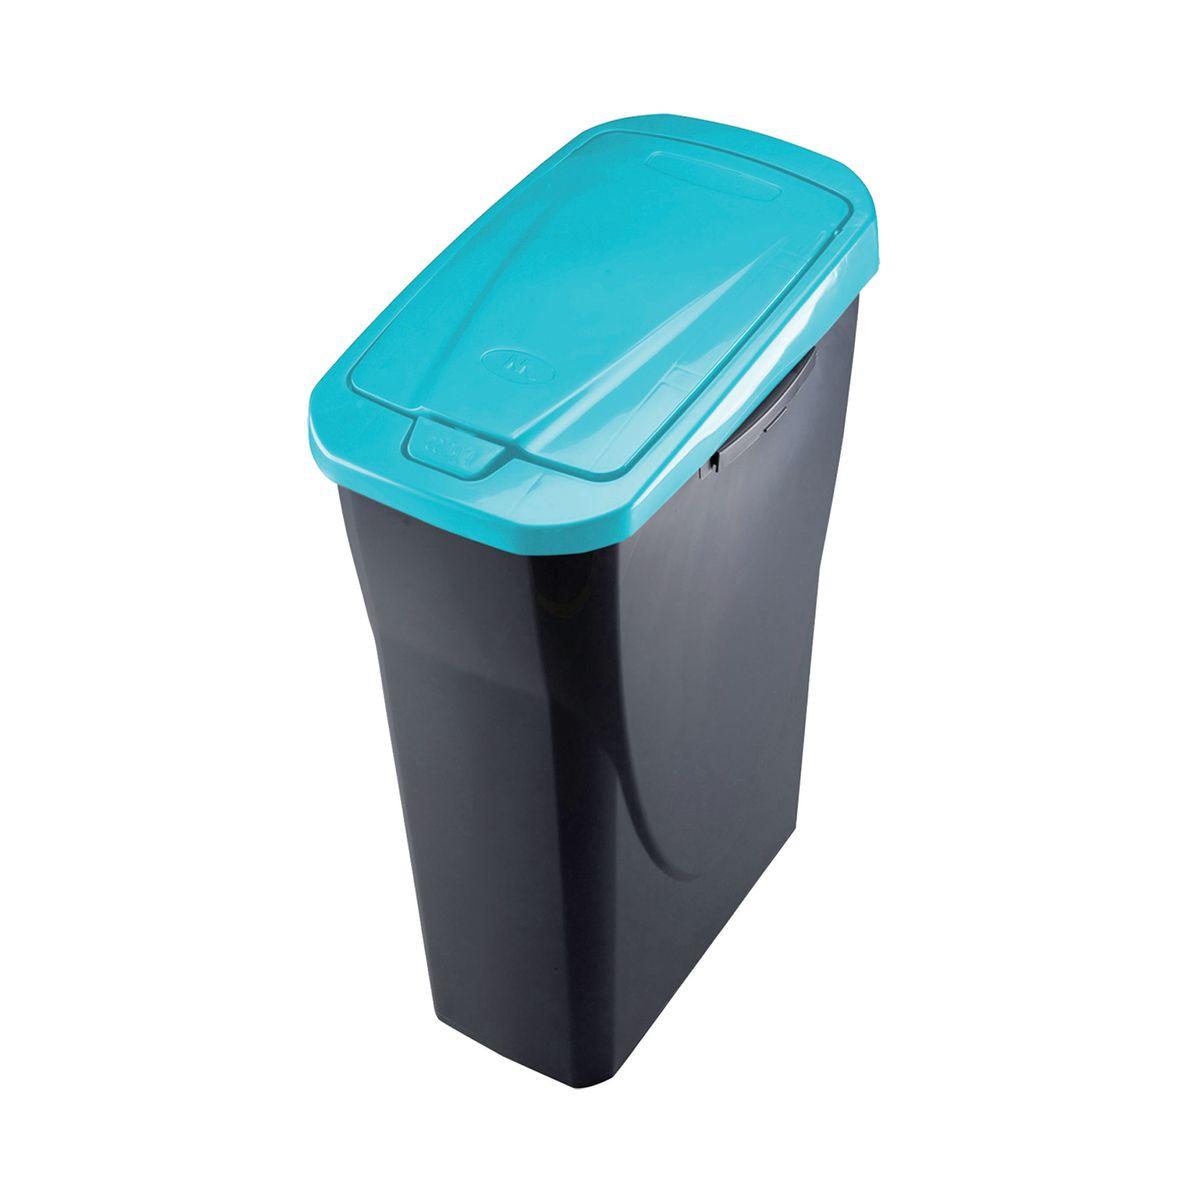 Leroy merlin contenitori per raccolta fabulous specifica for Leroy merlin contenitori